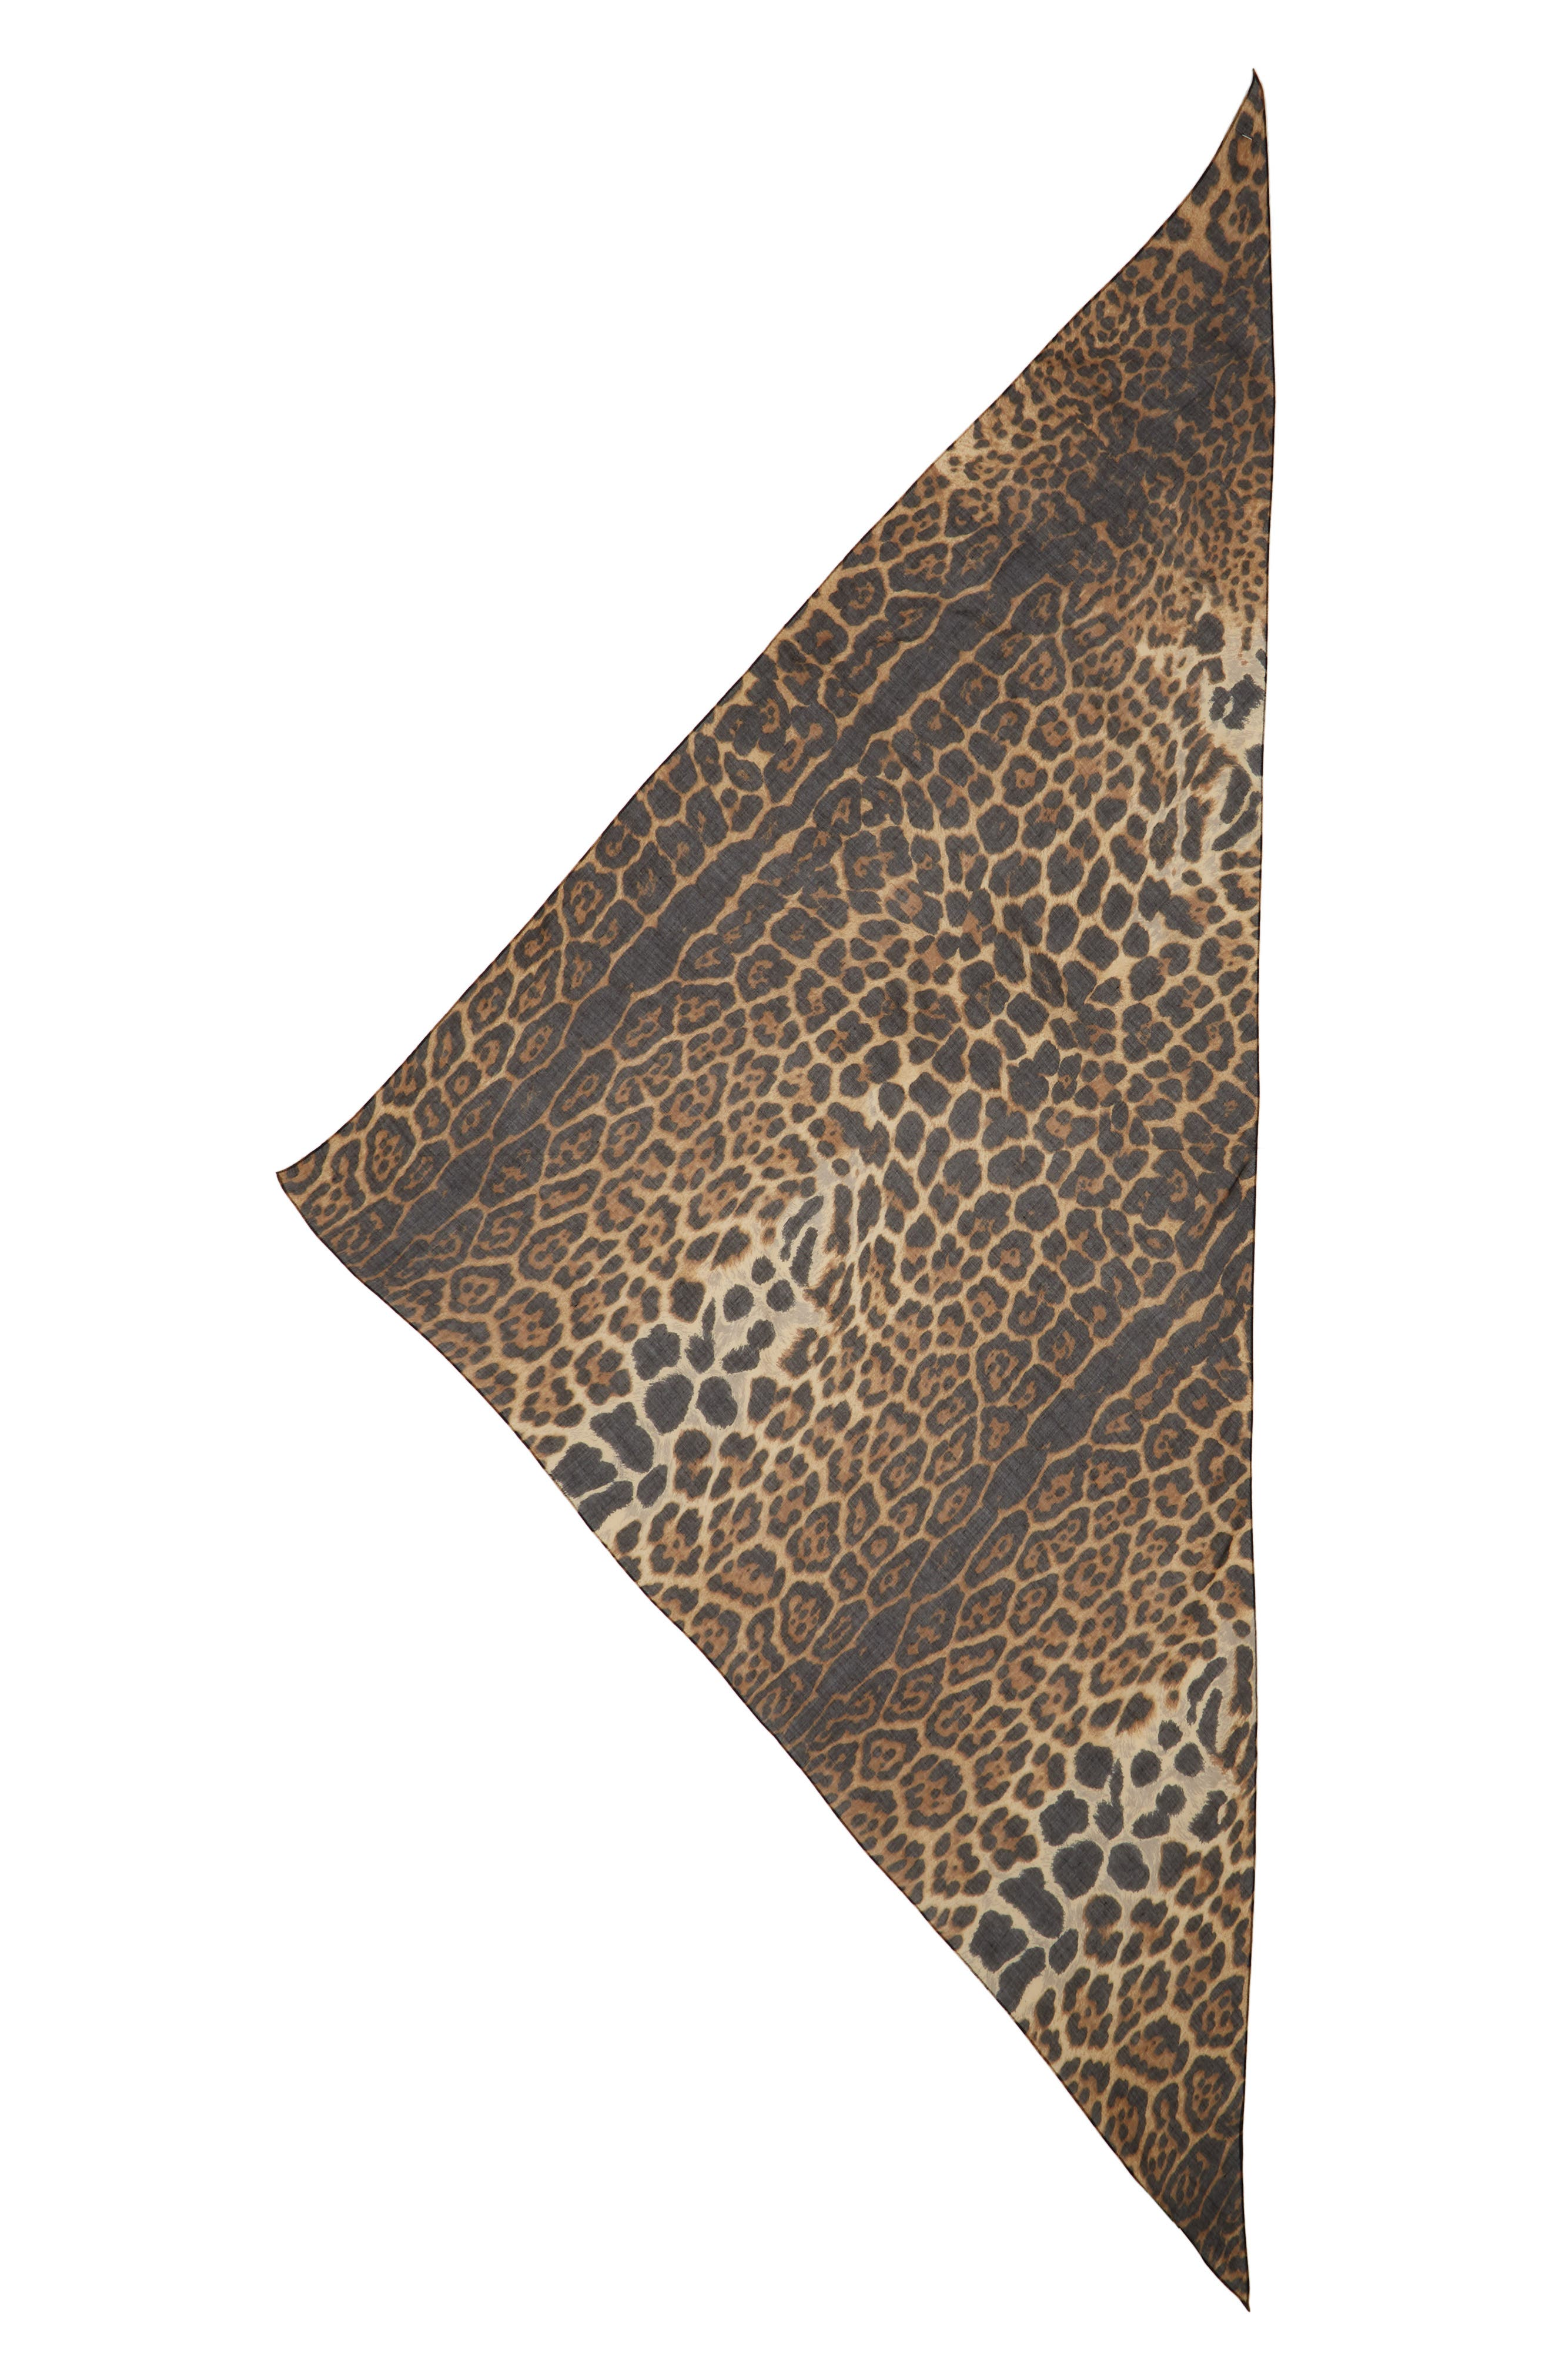 YSL Leopard Print Cashmere & Silk Triangle Scarf,                         Main,                         color, Mahogany/ Black